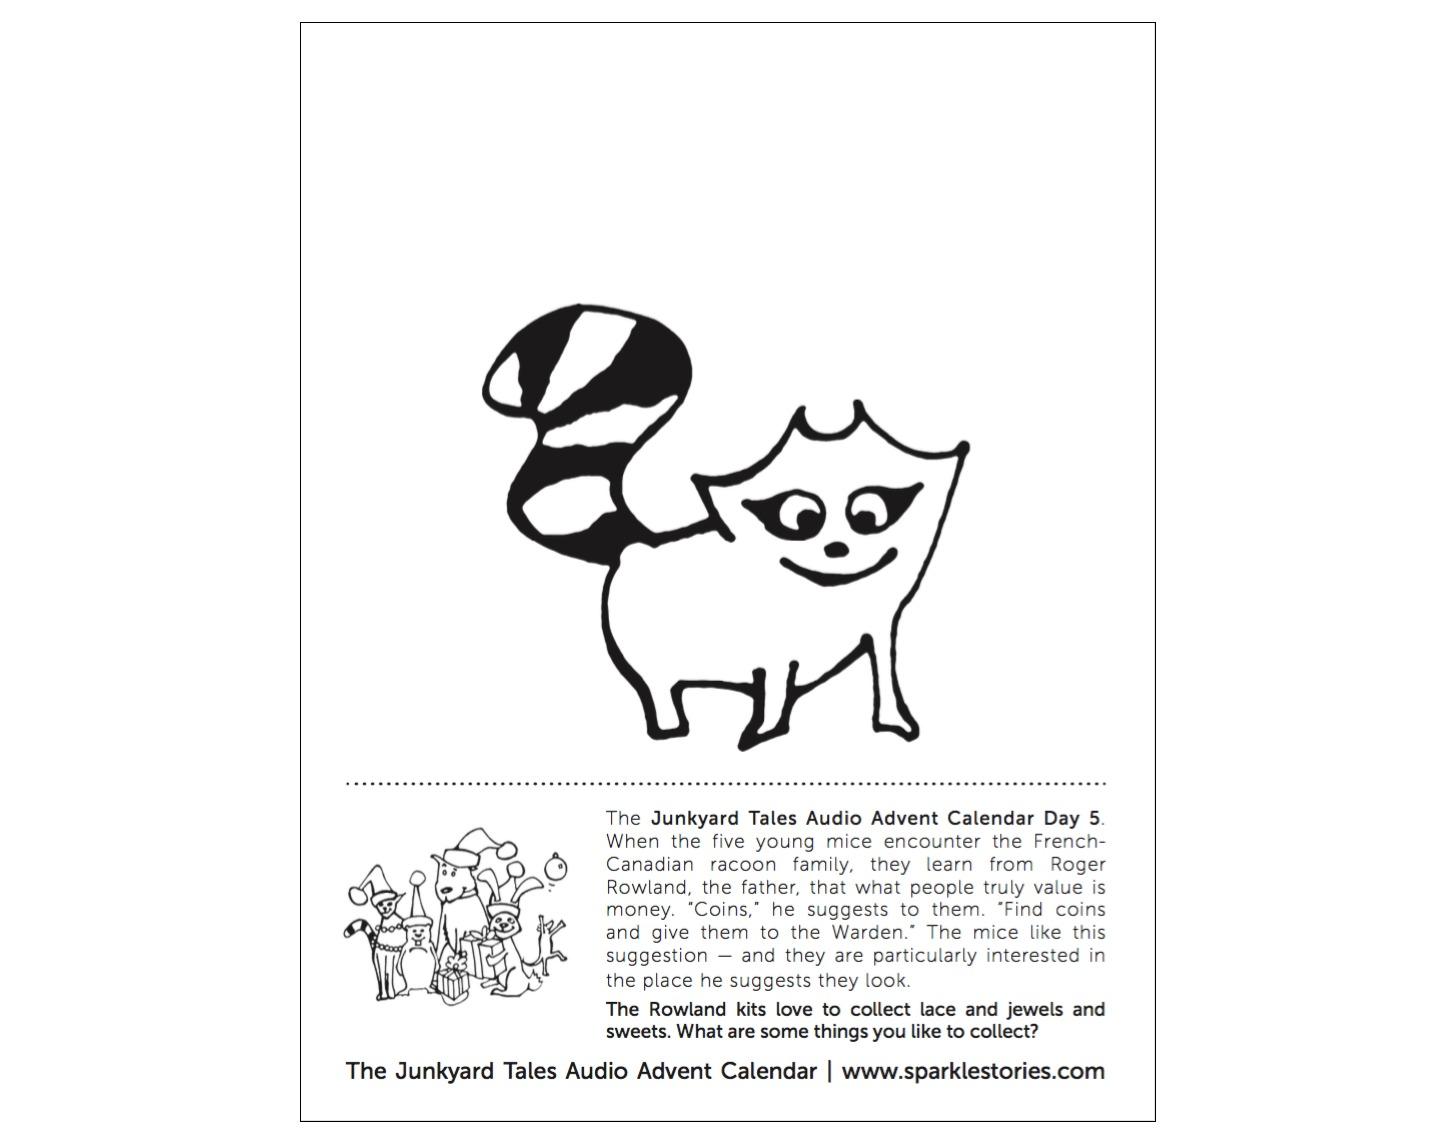 Junkyard Tales Audio Advent Calendar